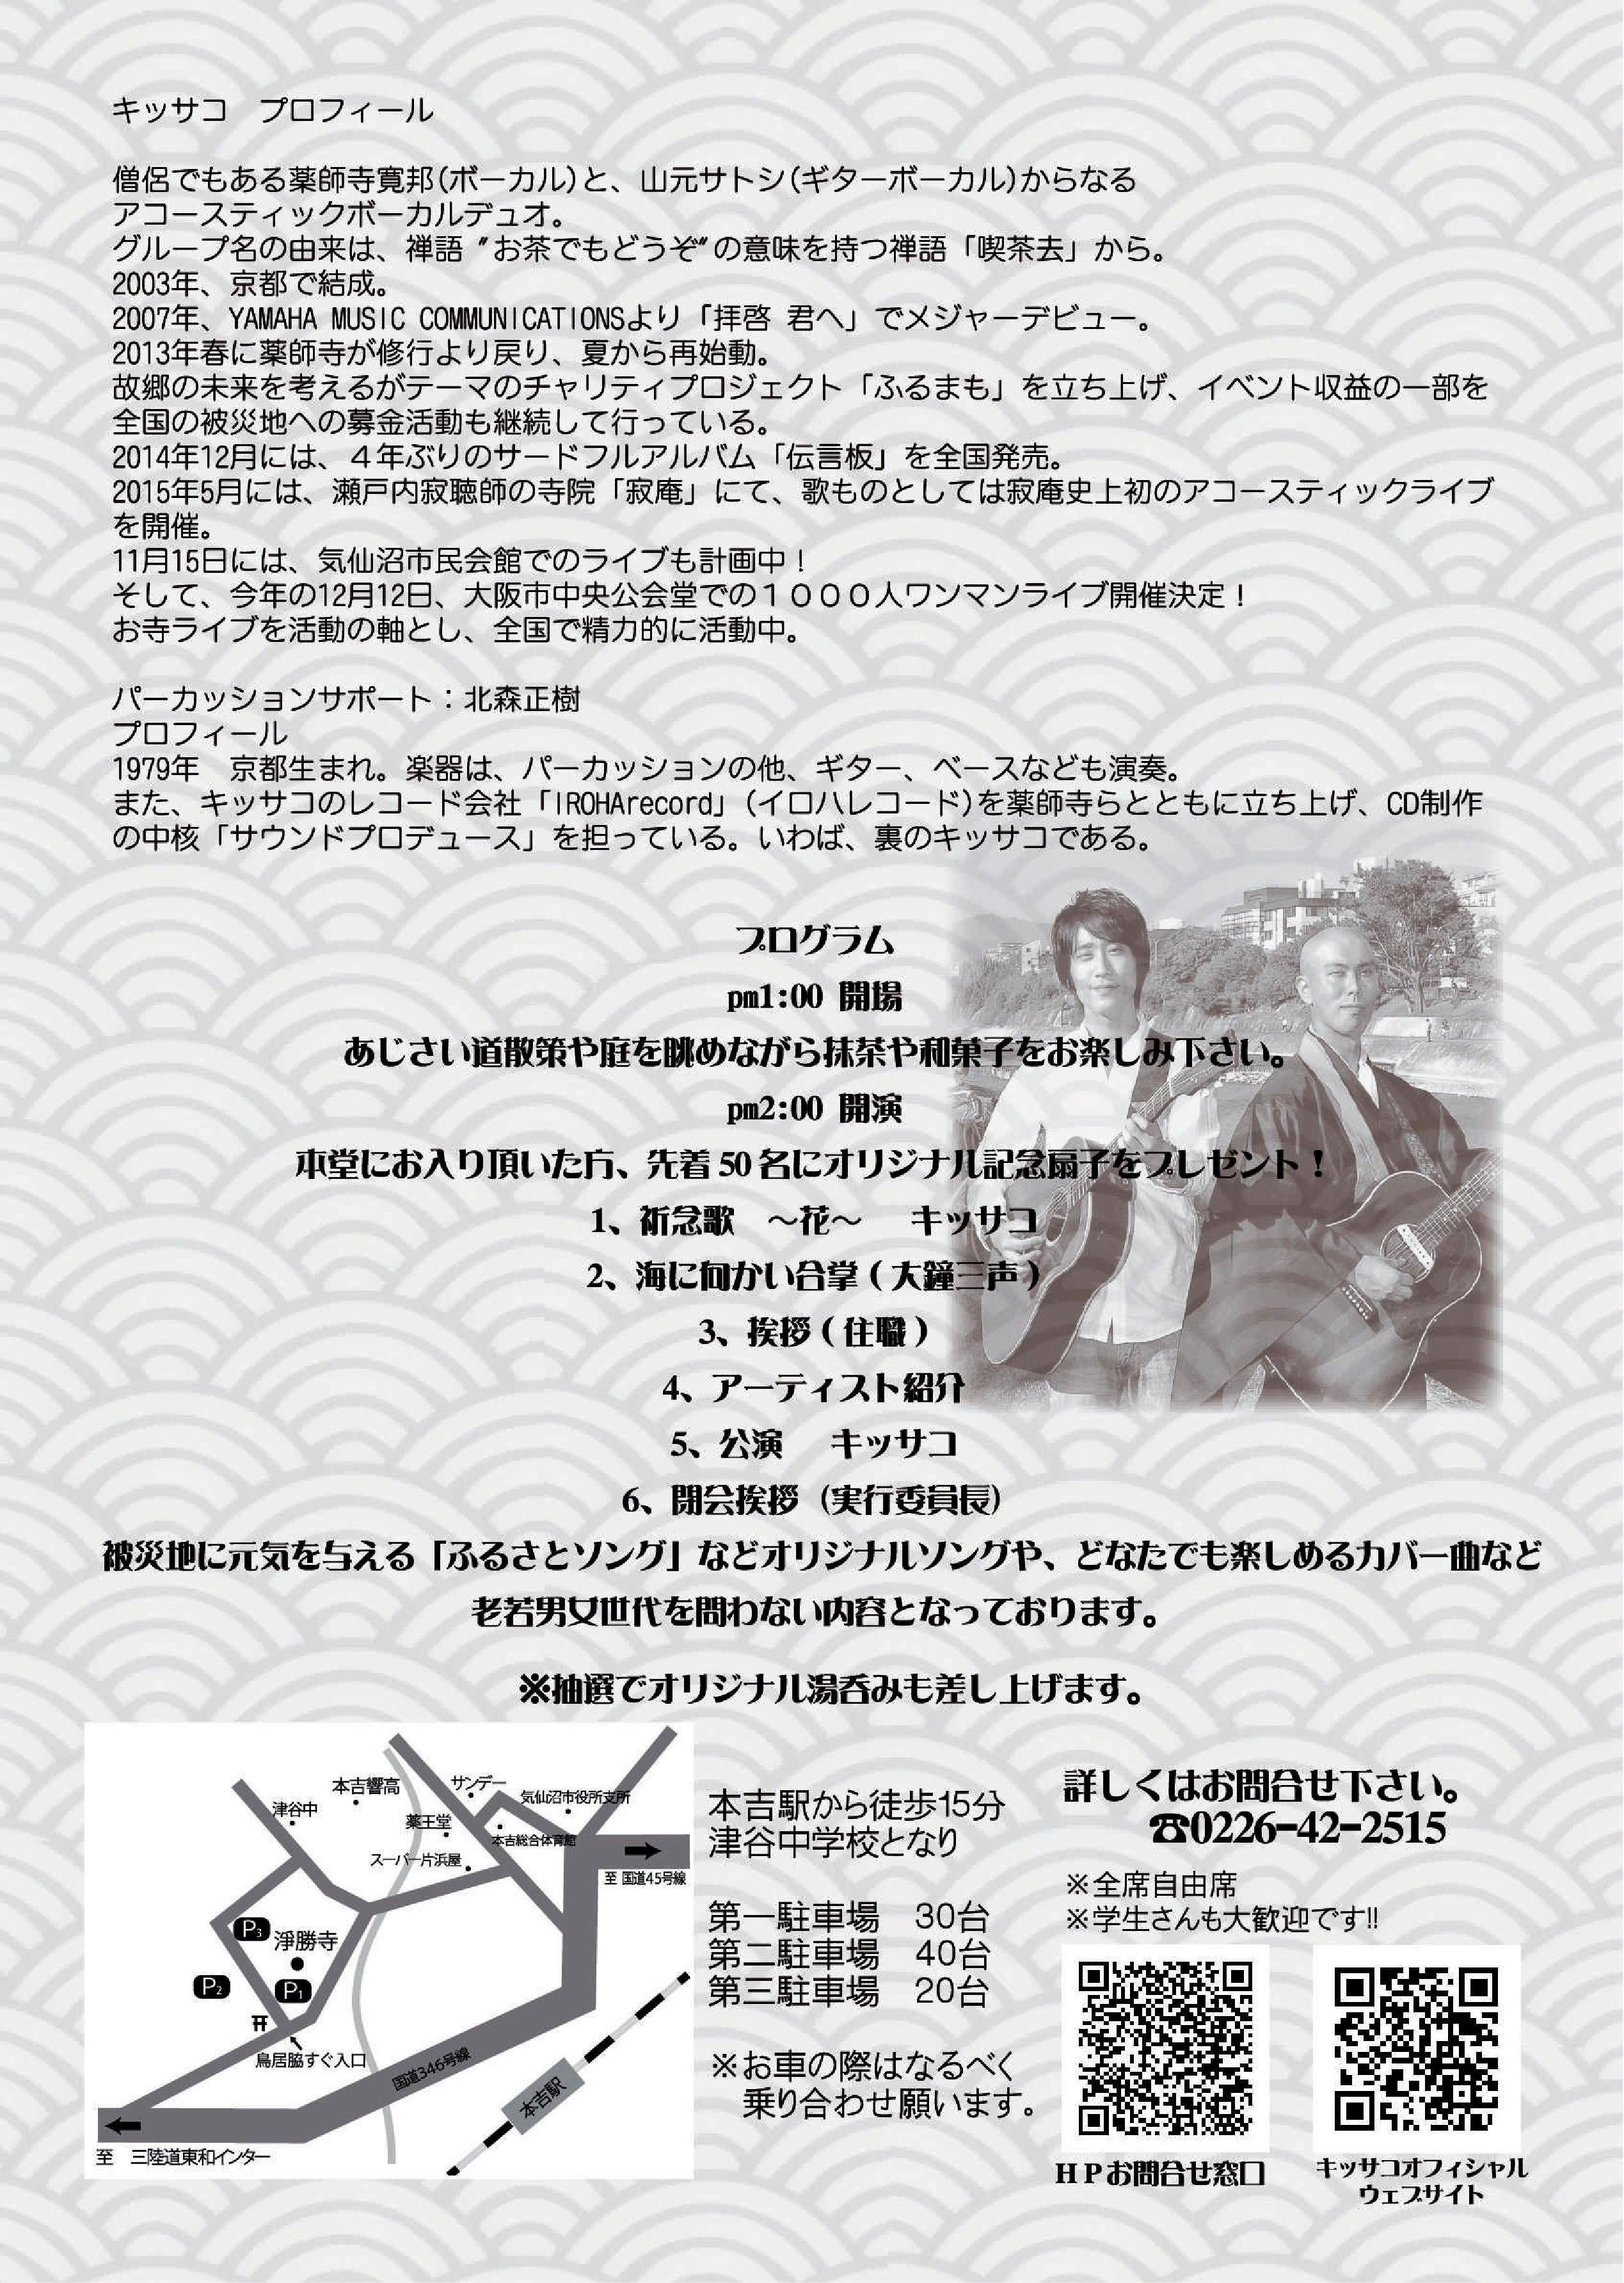 東日本大震災復興祈念 キッサコライブ in 気仙沼 浄勝寺(裏)